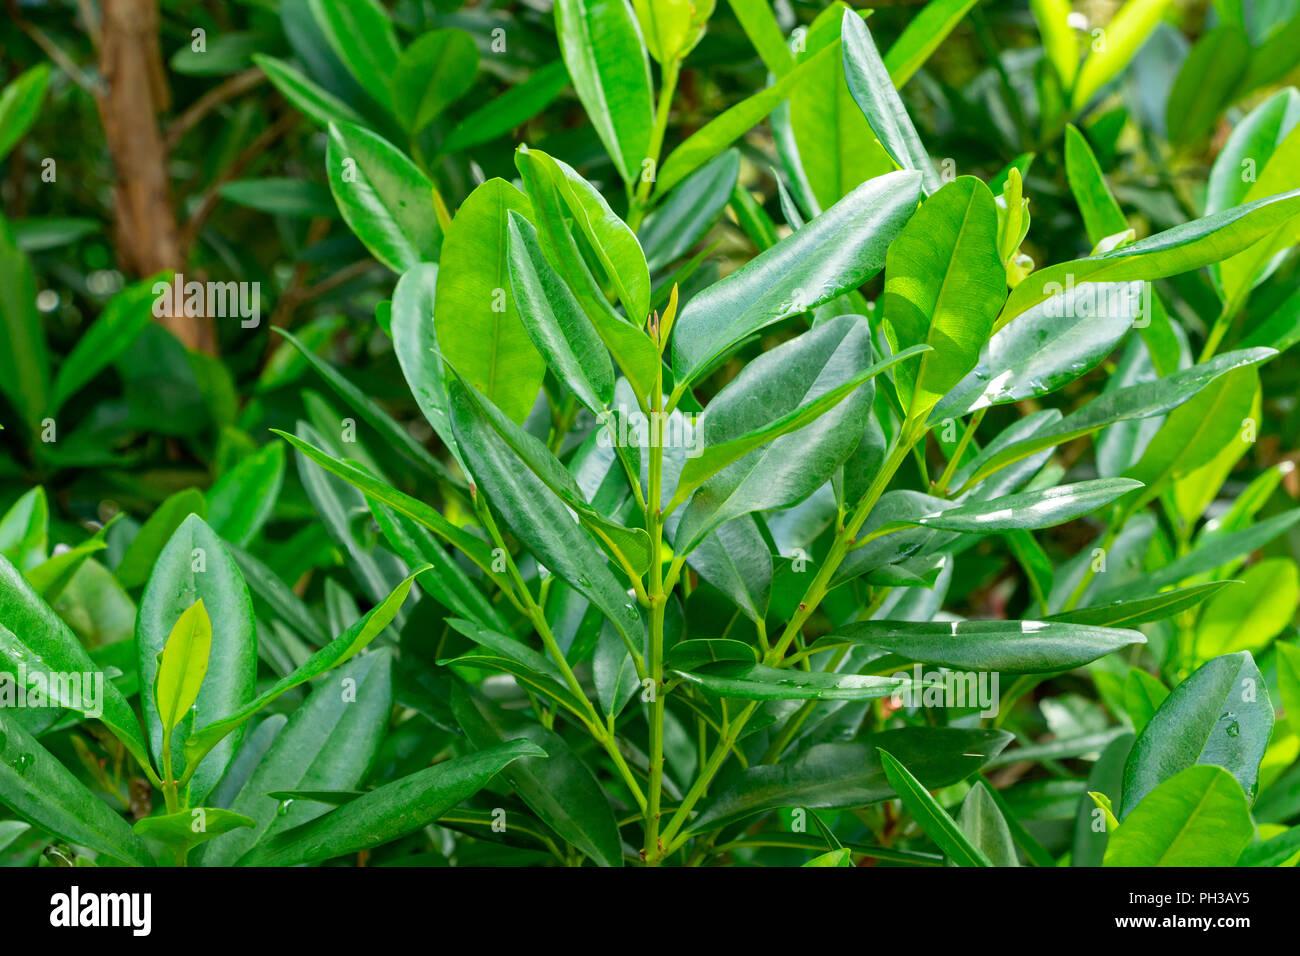 Pimenta Racemosa